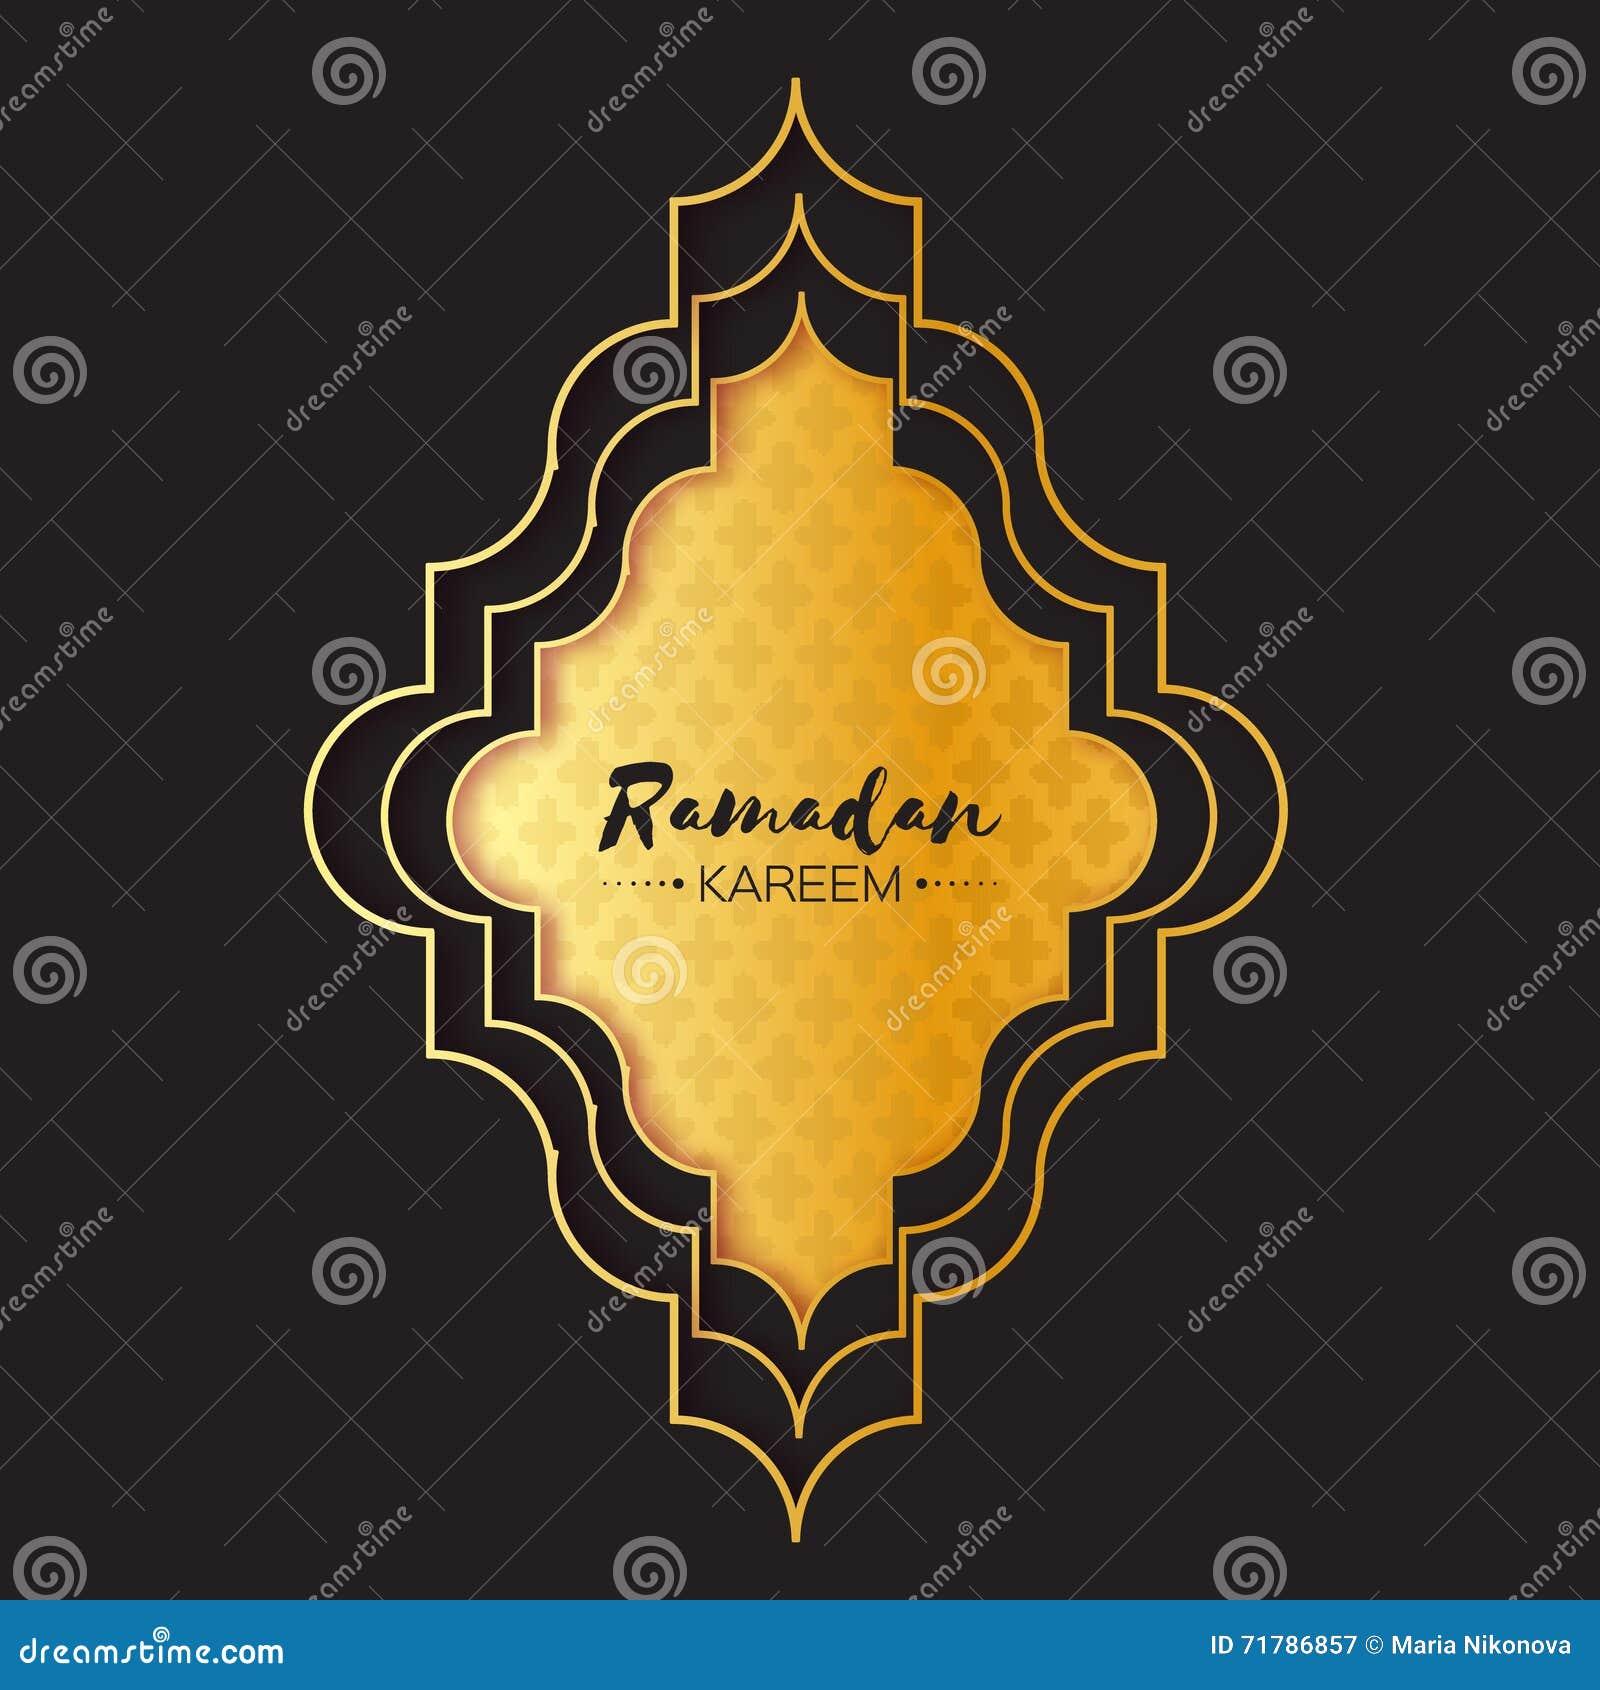 Gold Ramadan Kareem Greeting Card With Geometric Graphic Arabic